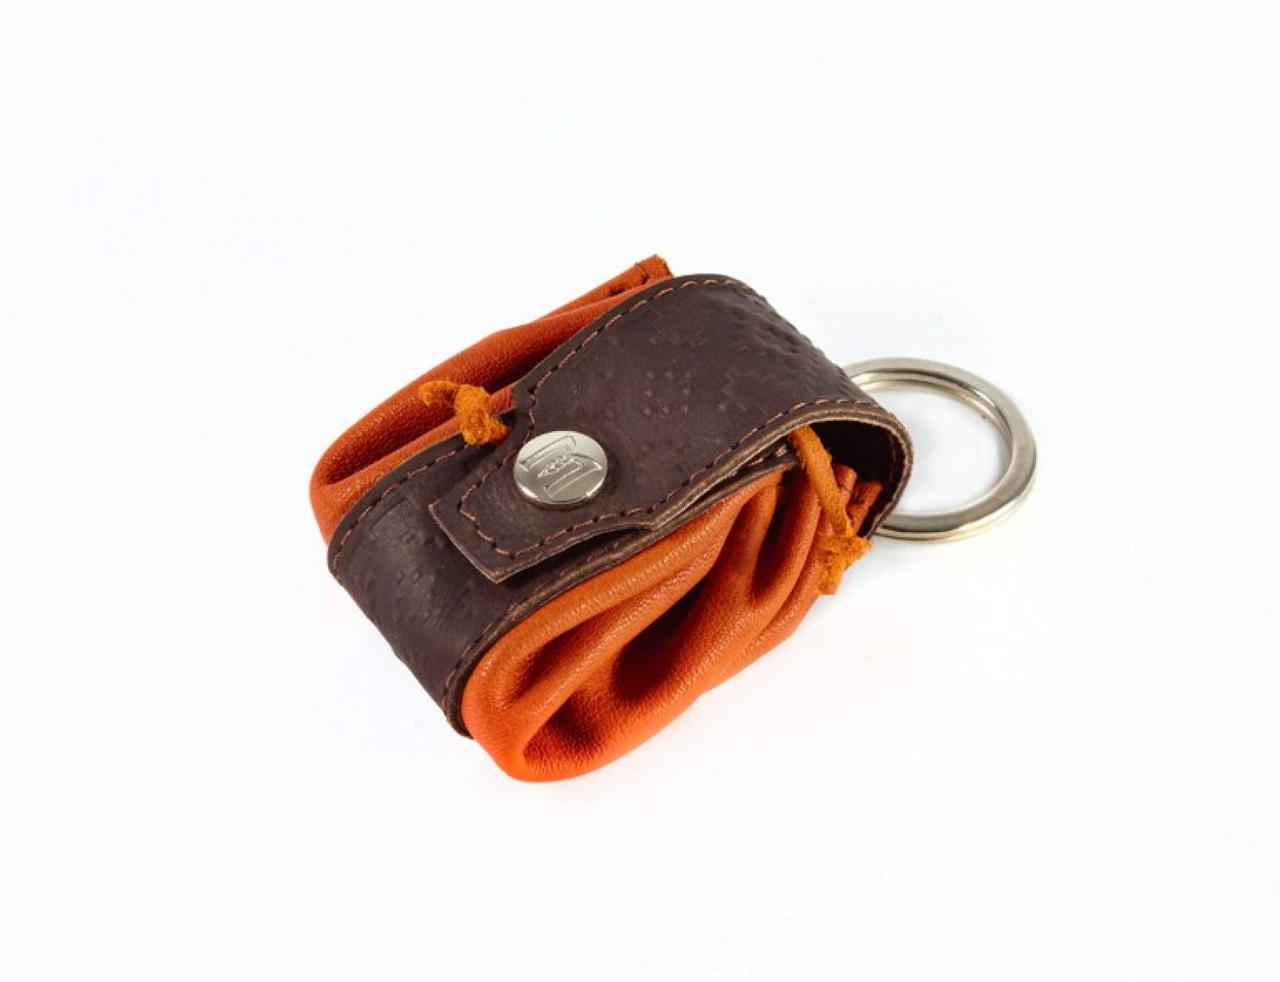 Брелок для ключей из кожи 540-07-63